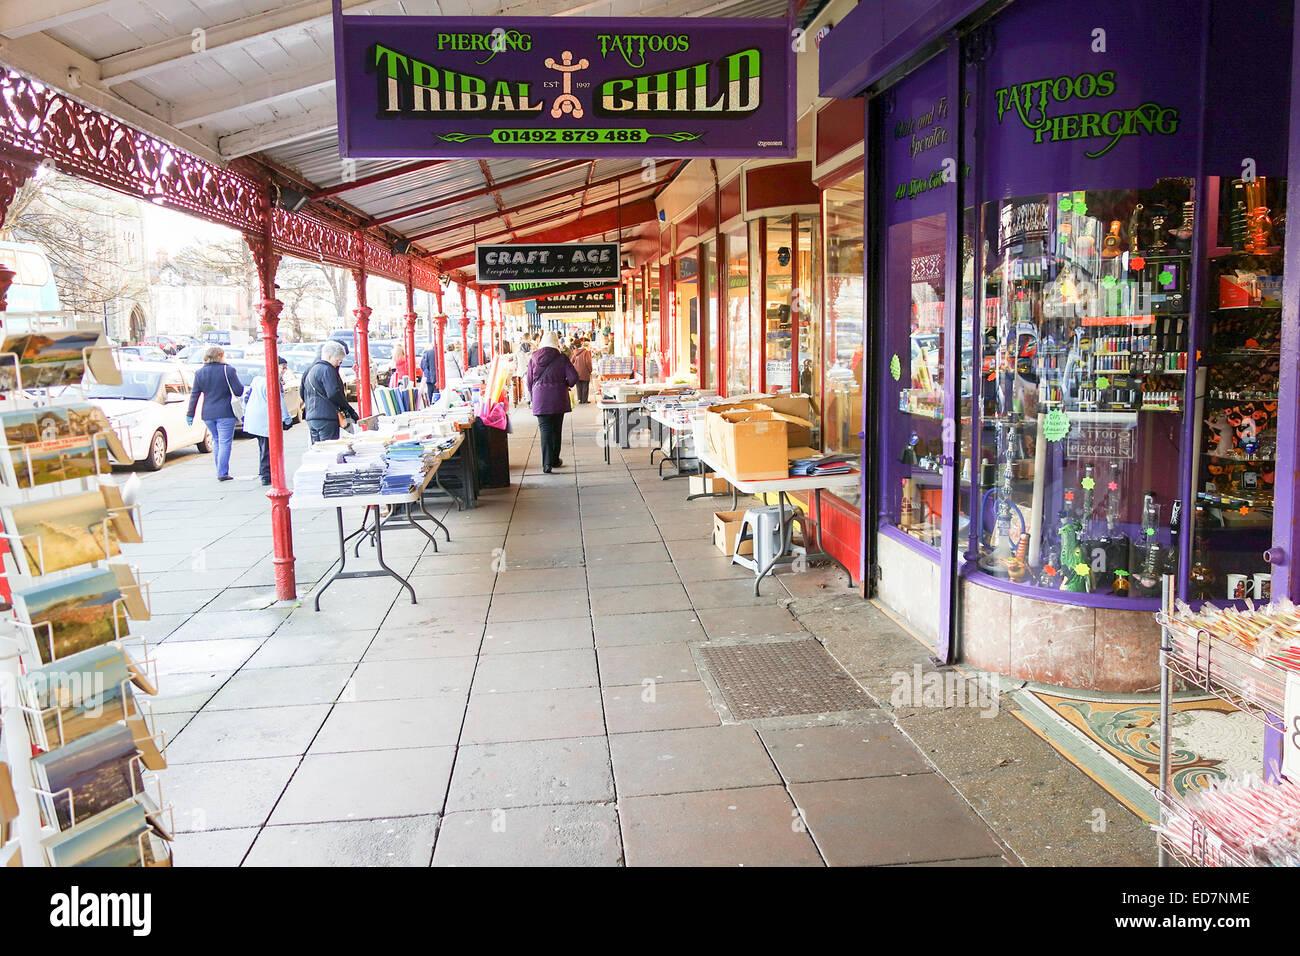 High Street Tattoo And Body Piercing Shop Stock Photo Alamy